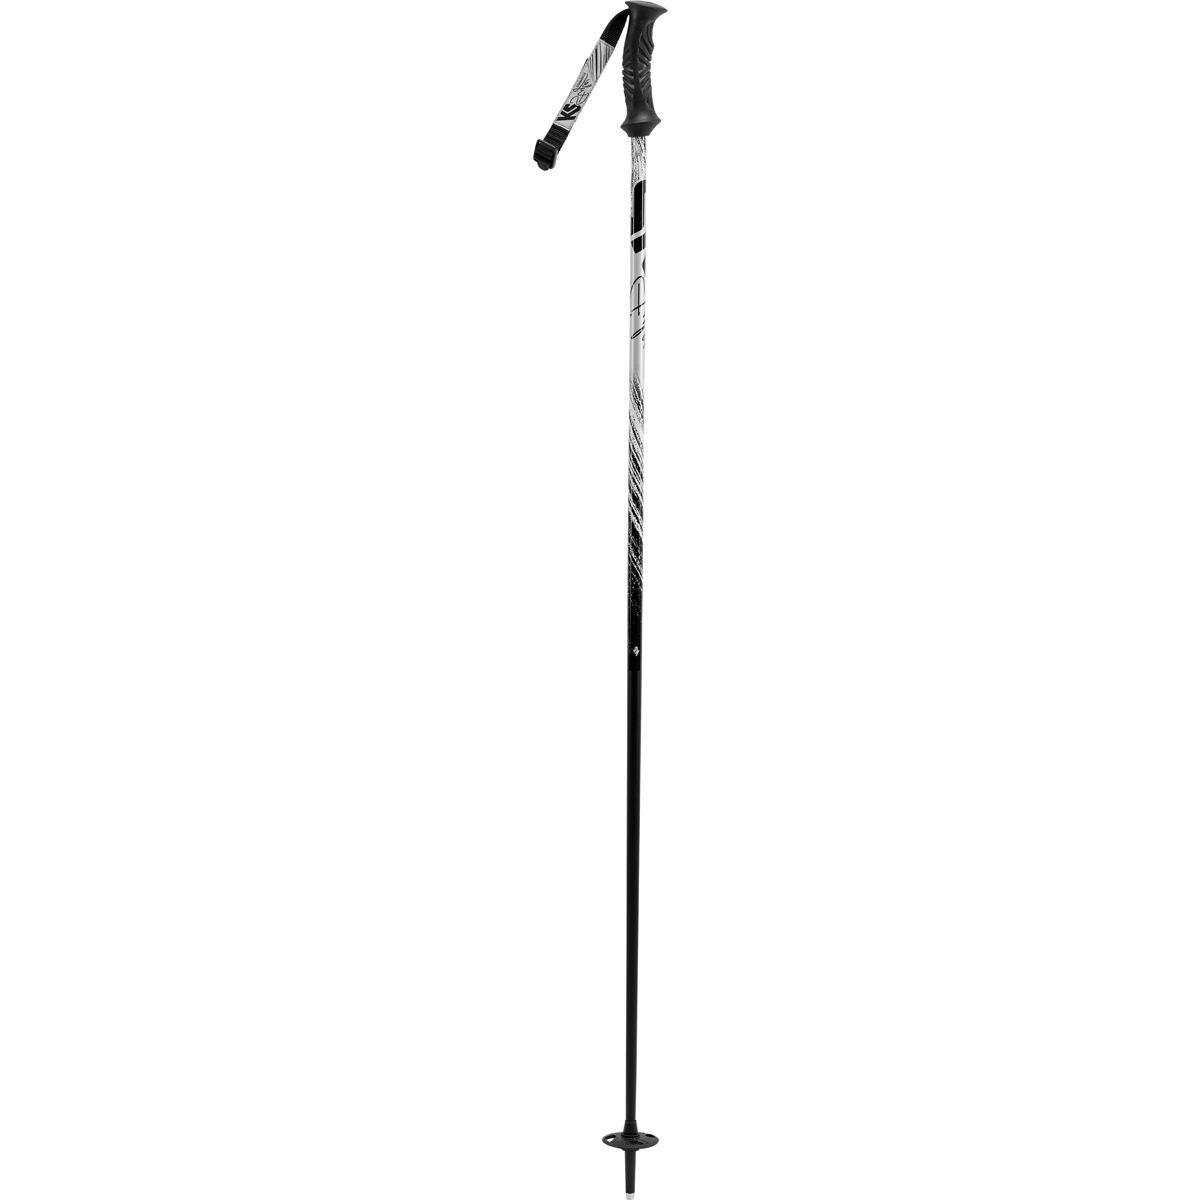 K2 Style Composite Ski Poles - Women's